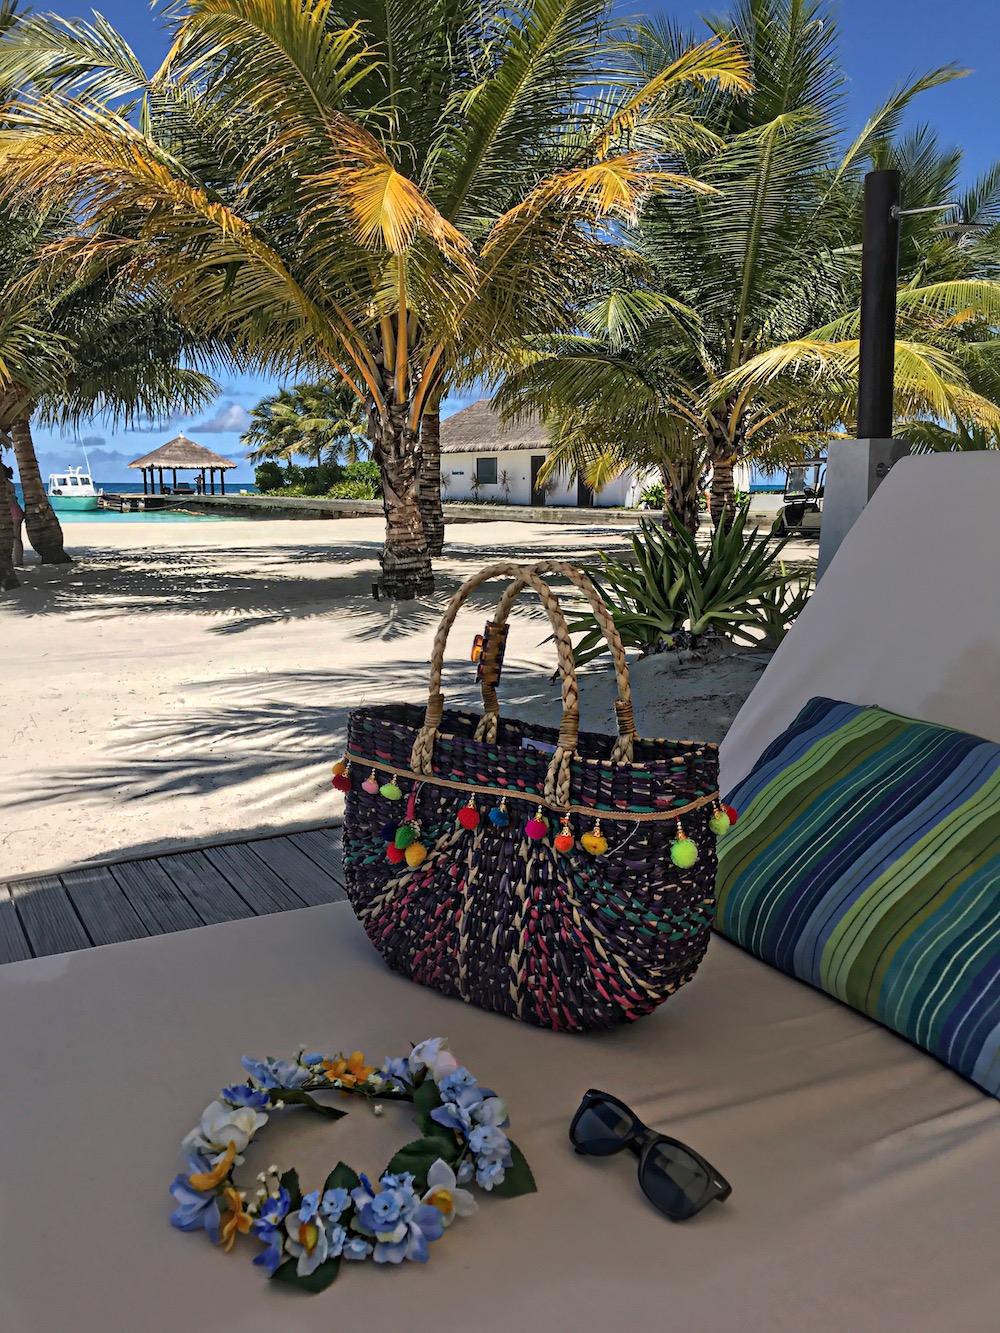 straw-pom-pom-bag-2017-alley-girl-fashion-travel-life-style-blog